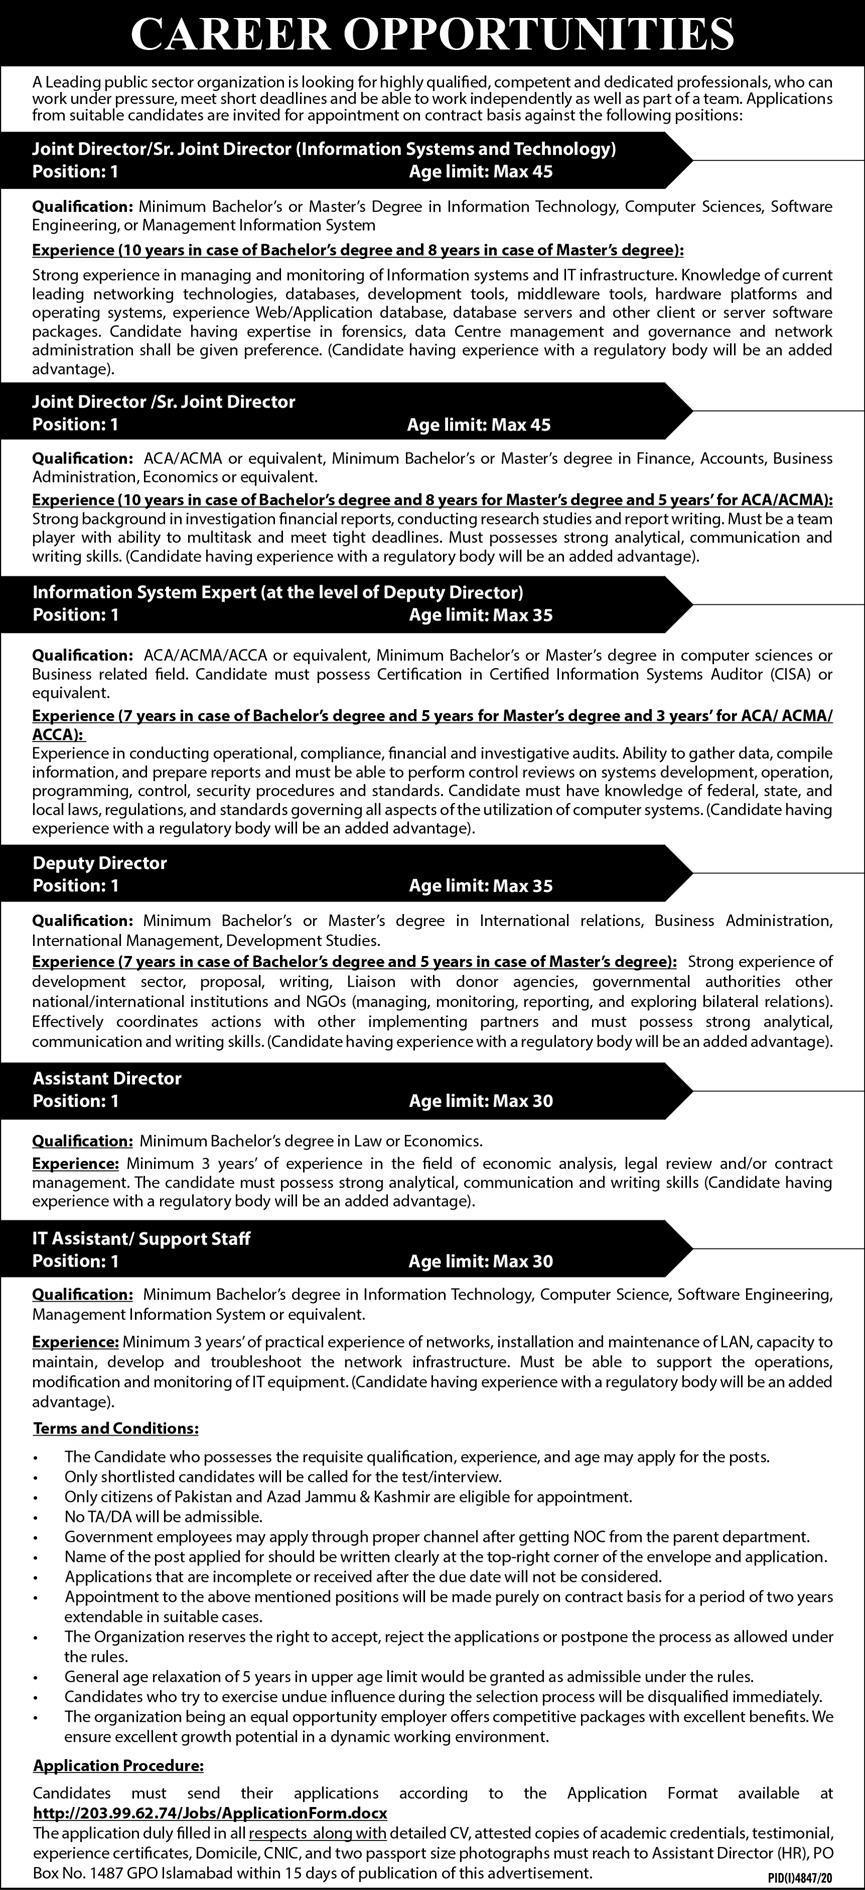 http://203.99.62.74/jobs/applicationform.docx - Download Job Application Form - Public Sector Organization PO Box 1487 Jobs 2021 in Pakistan